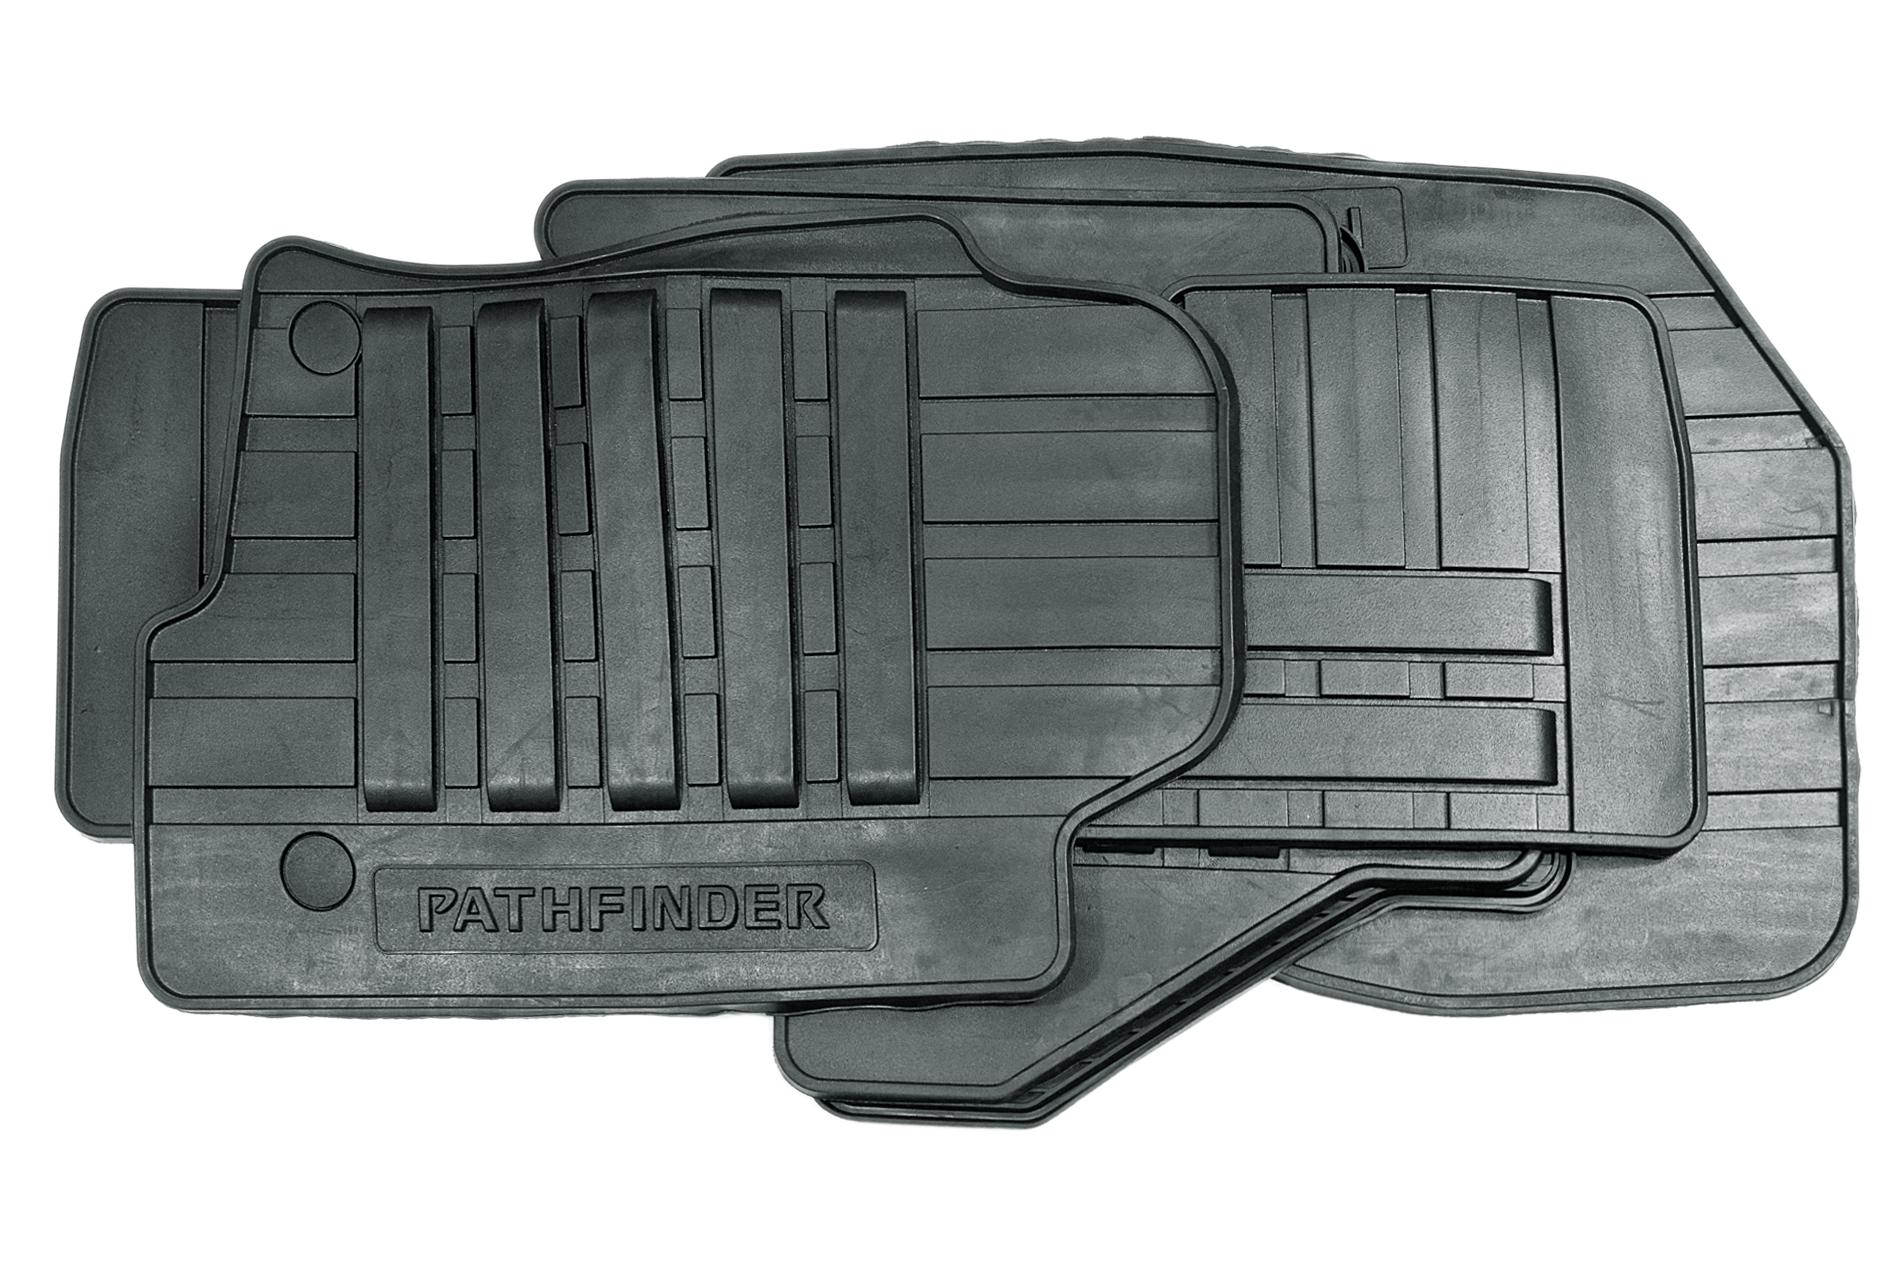 Weathertech floor mats nissan pathfinder - Nissan Pathfinder Floor Mats Nissan Pathfinder Genuine Car Floor Mats